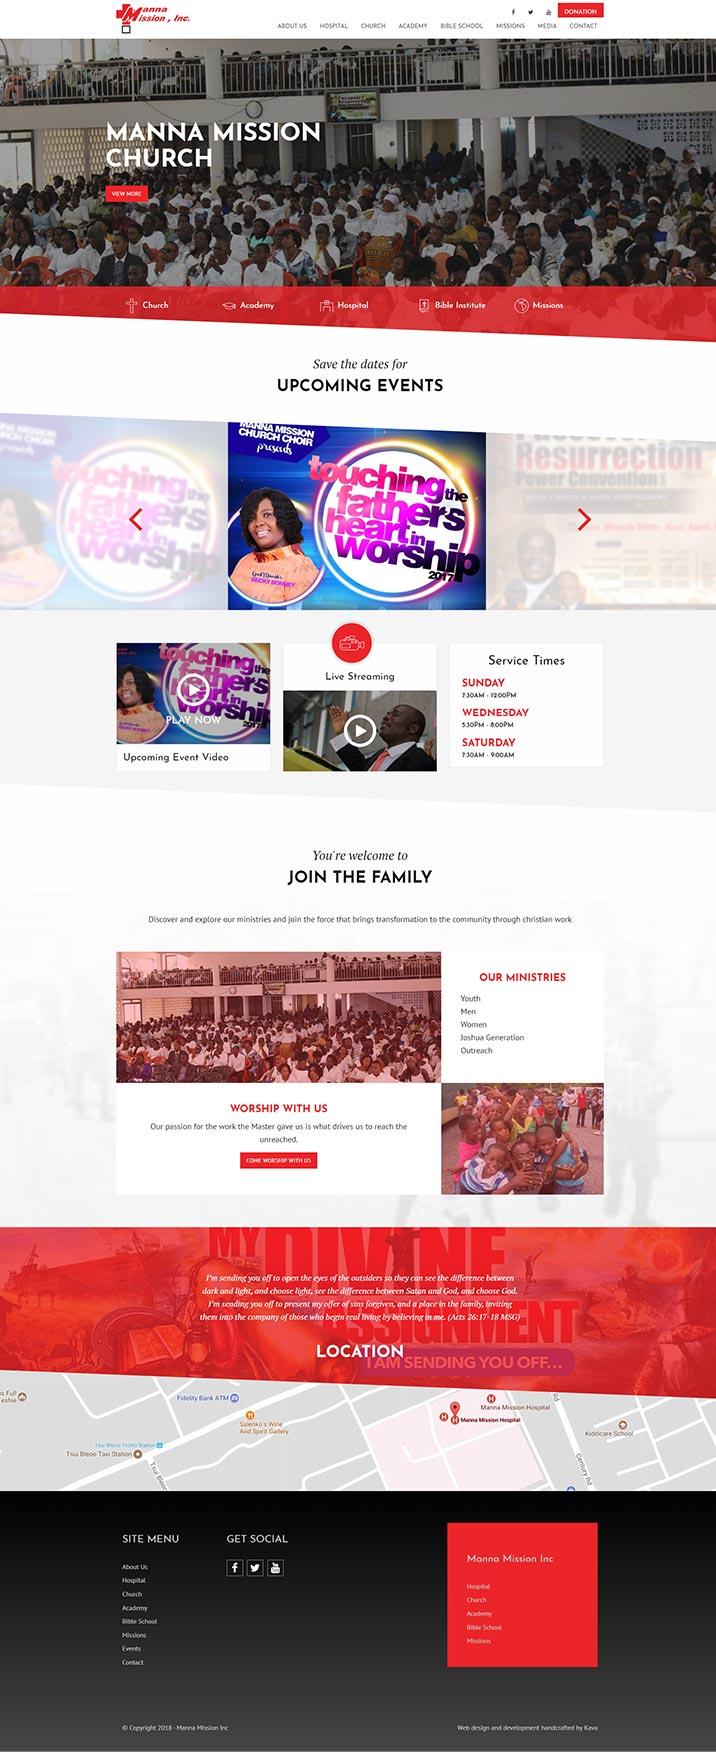 Best Leading Web Design Company In Ghana Website Development Website Designers In Accra Ghana Kava Media